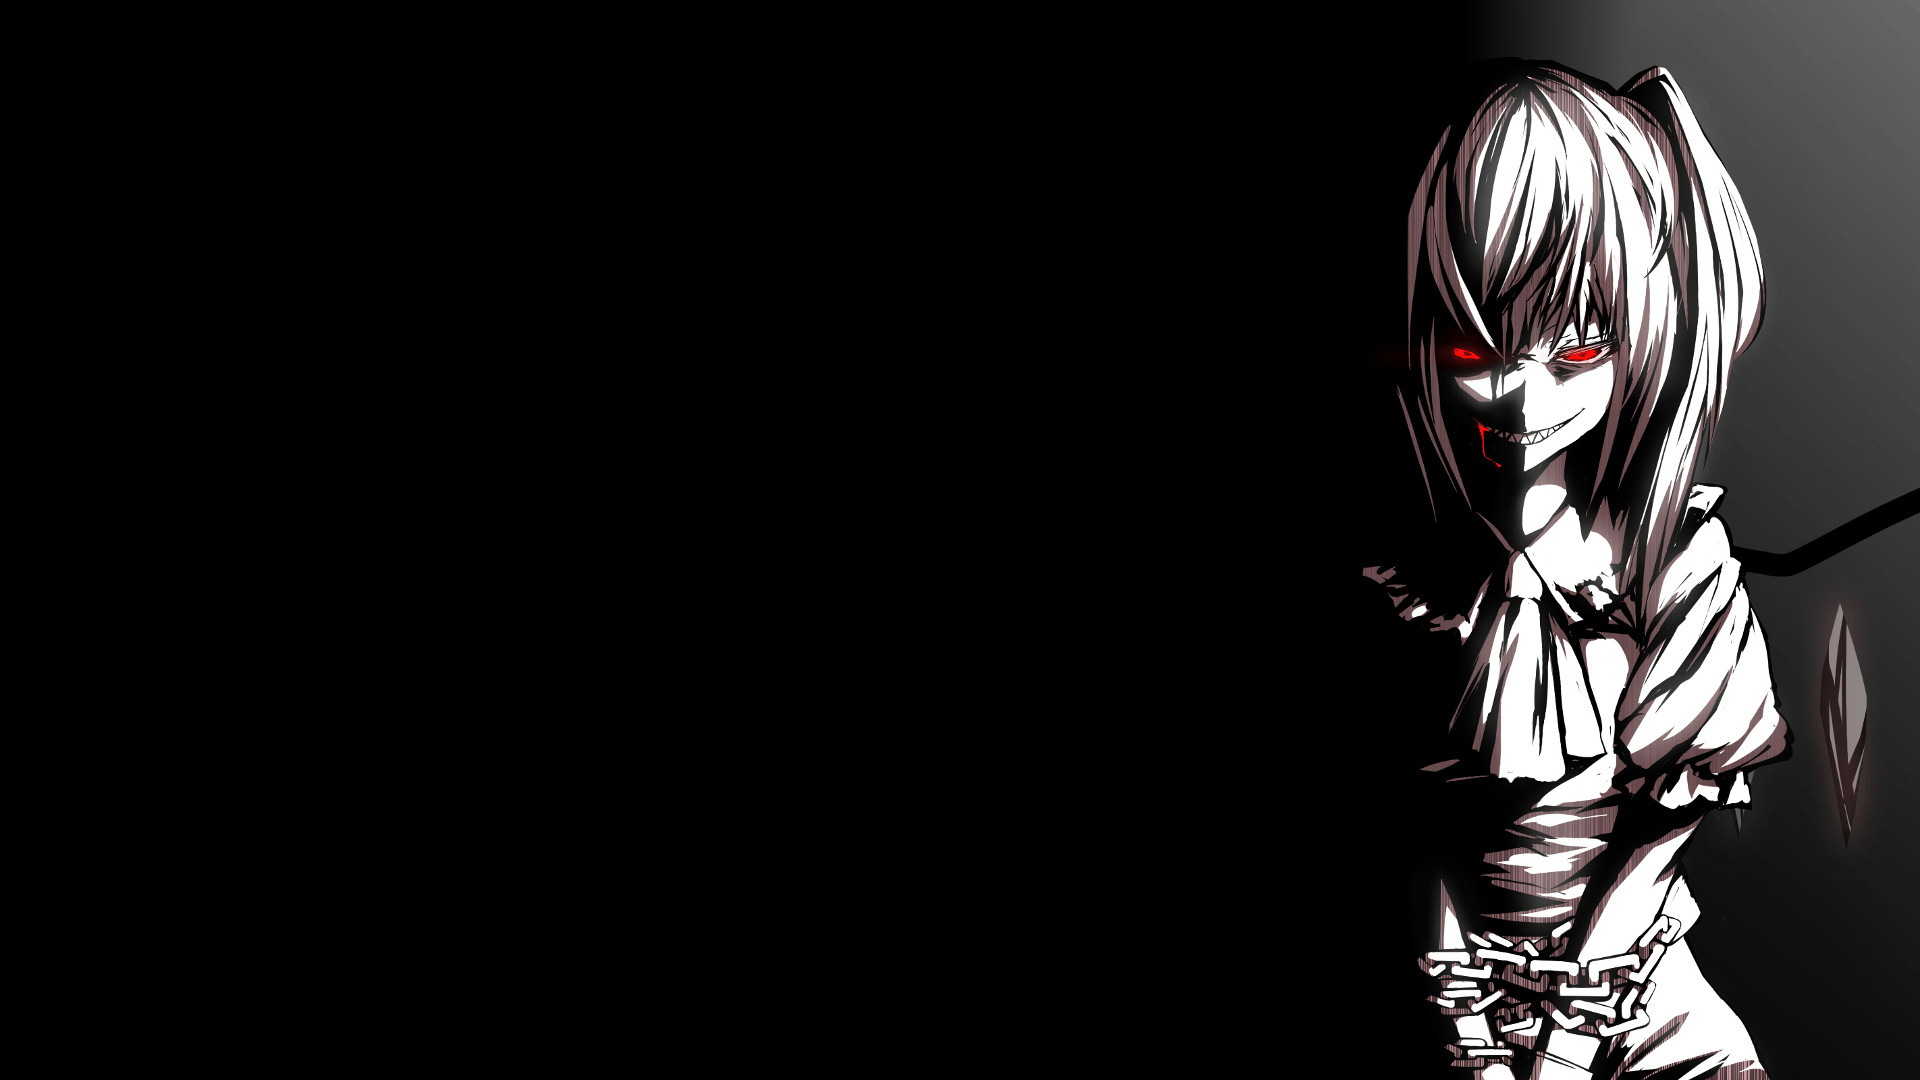 Wallpapers Dark Anime Flandre Scarlet P Oshop Red Eyes Touhou .